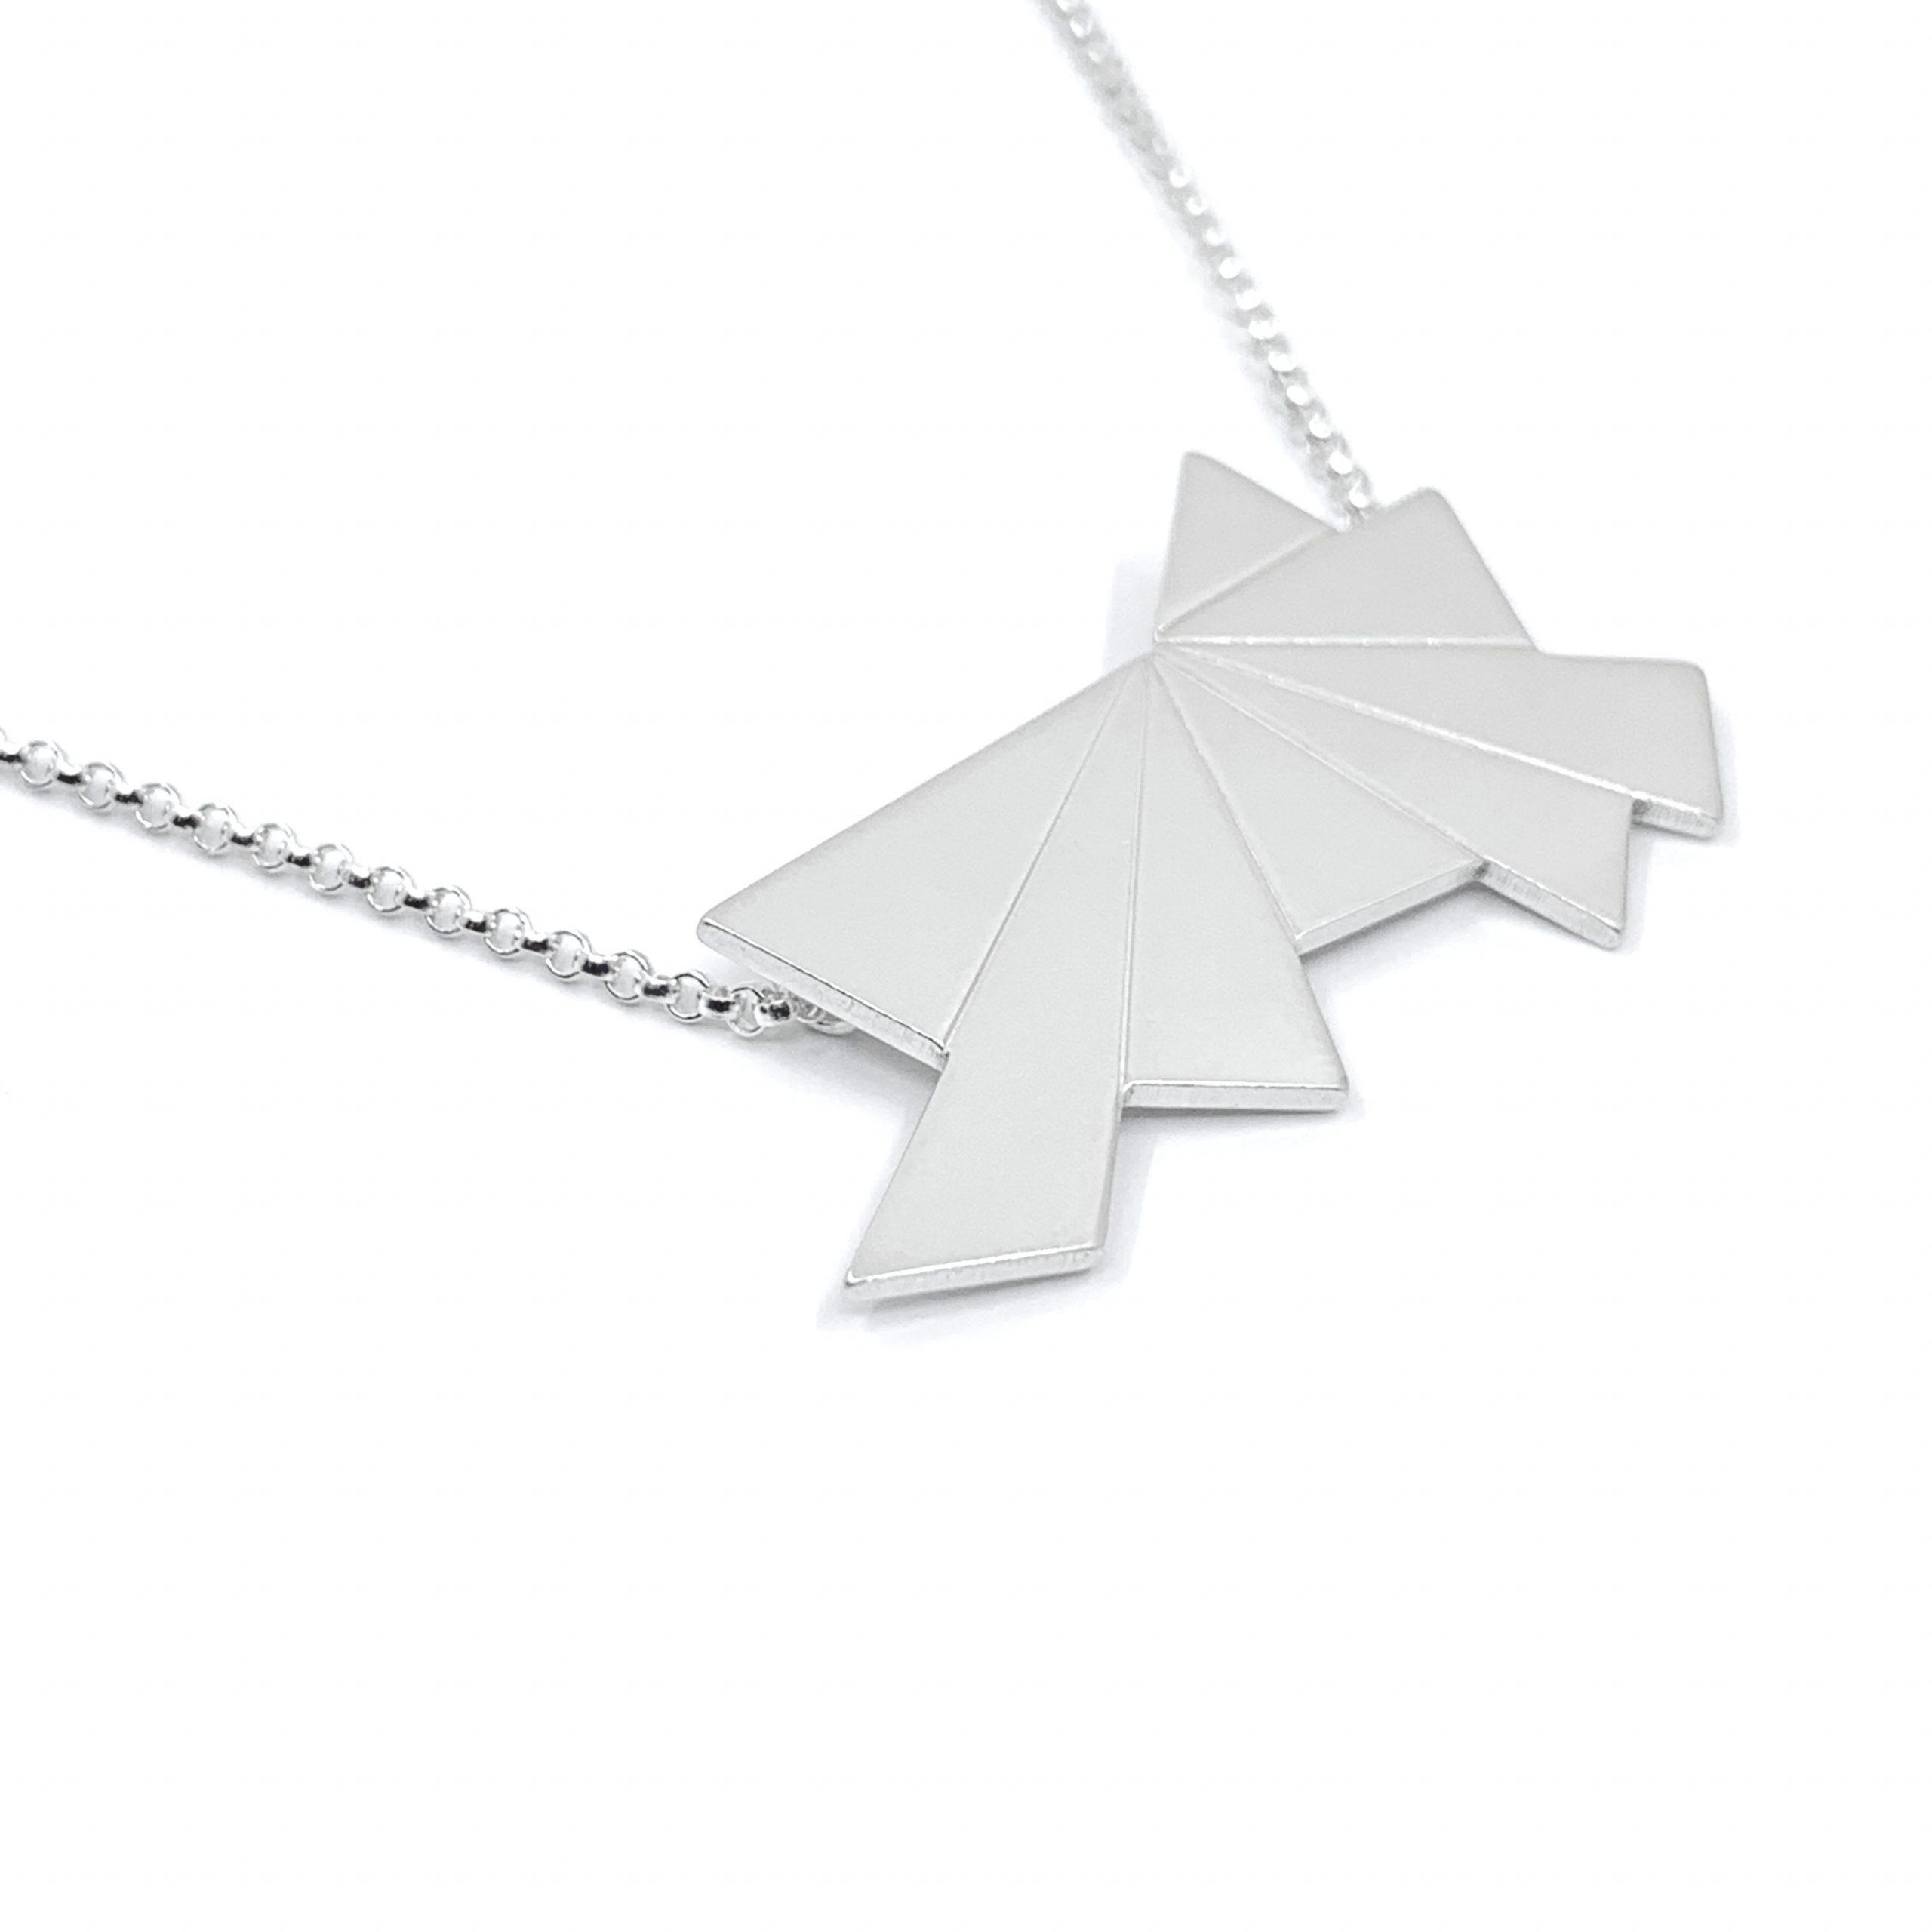 Dawn silver necklace